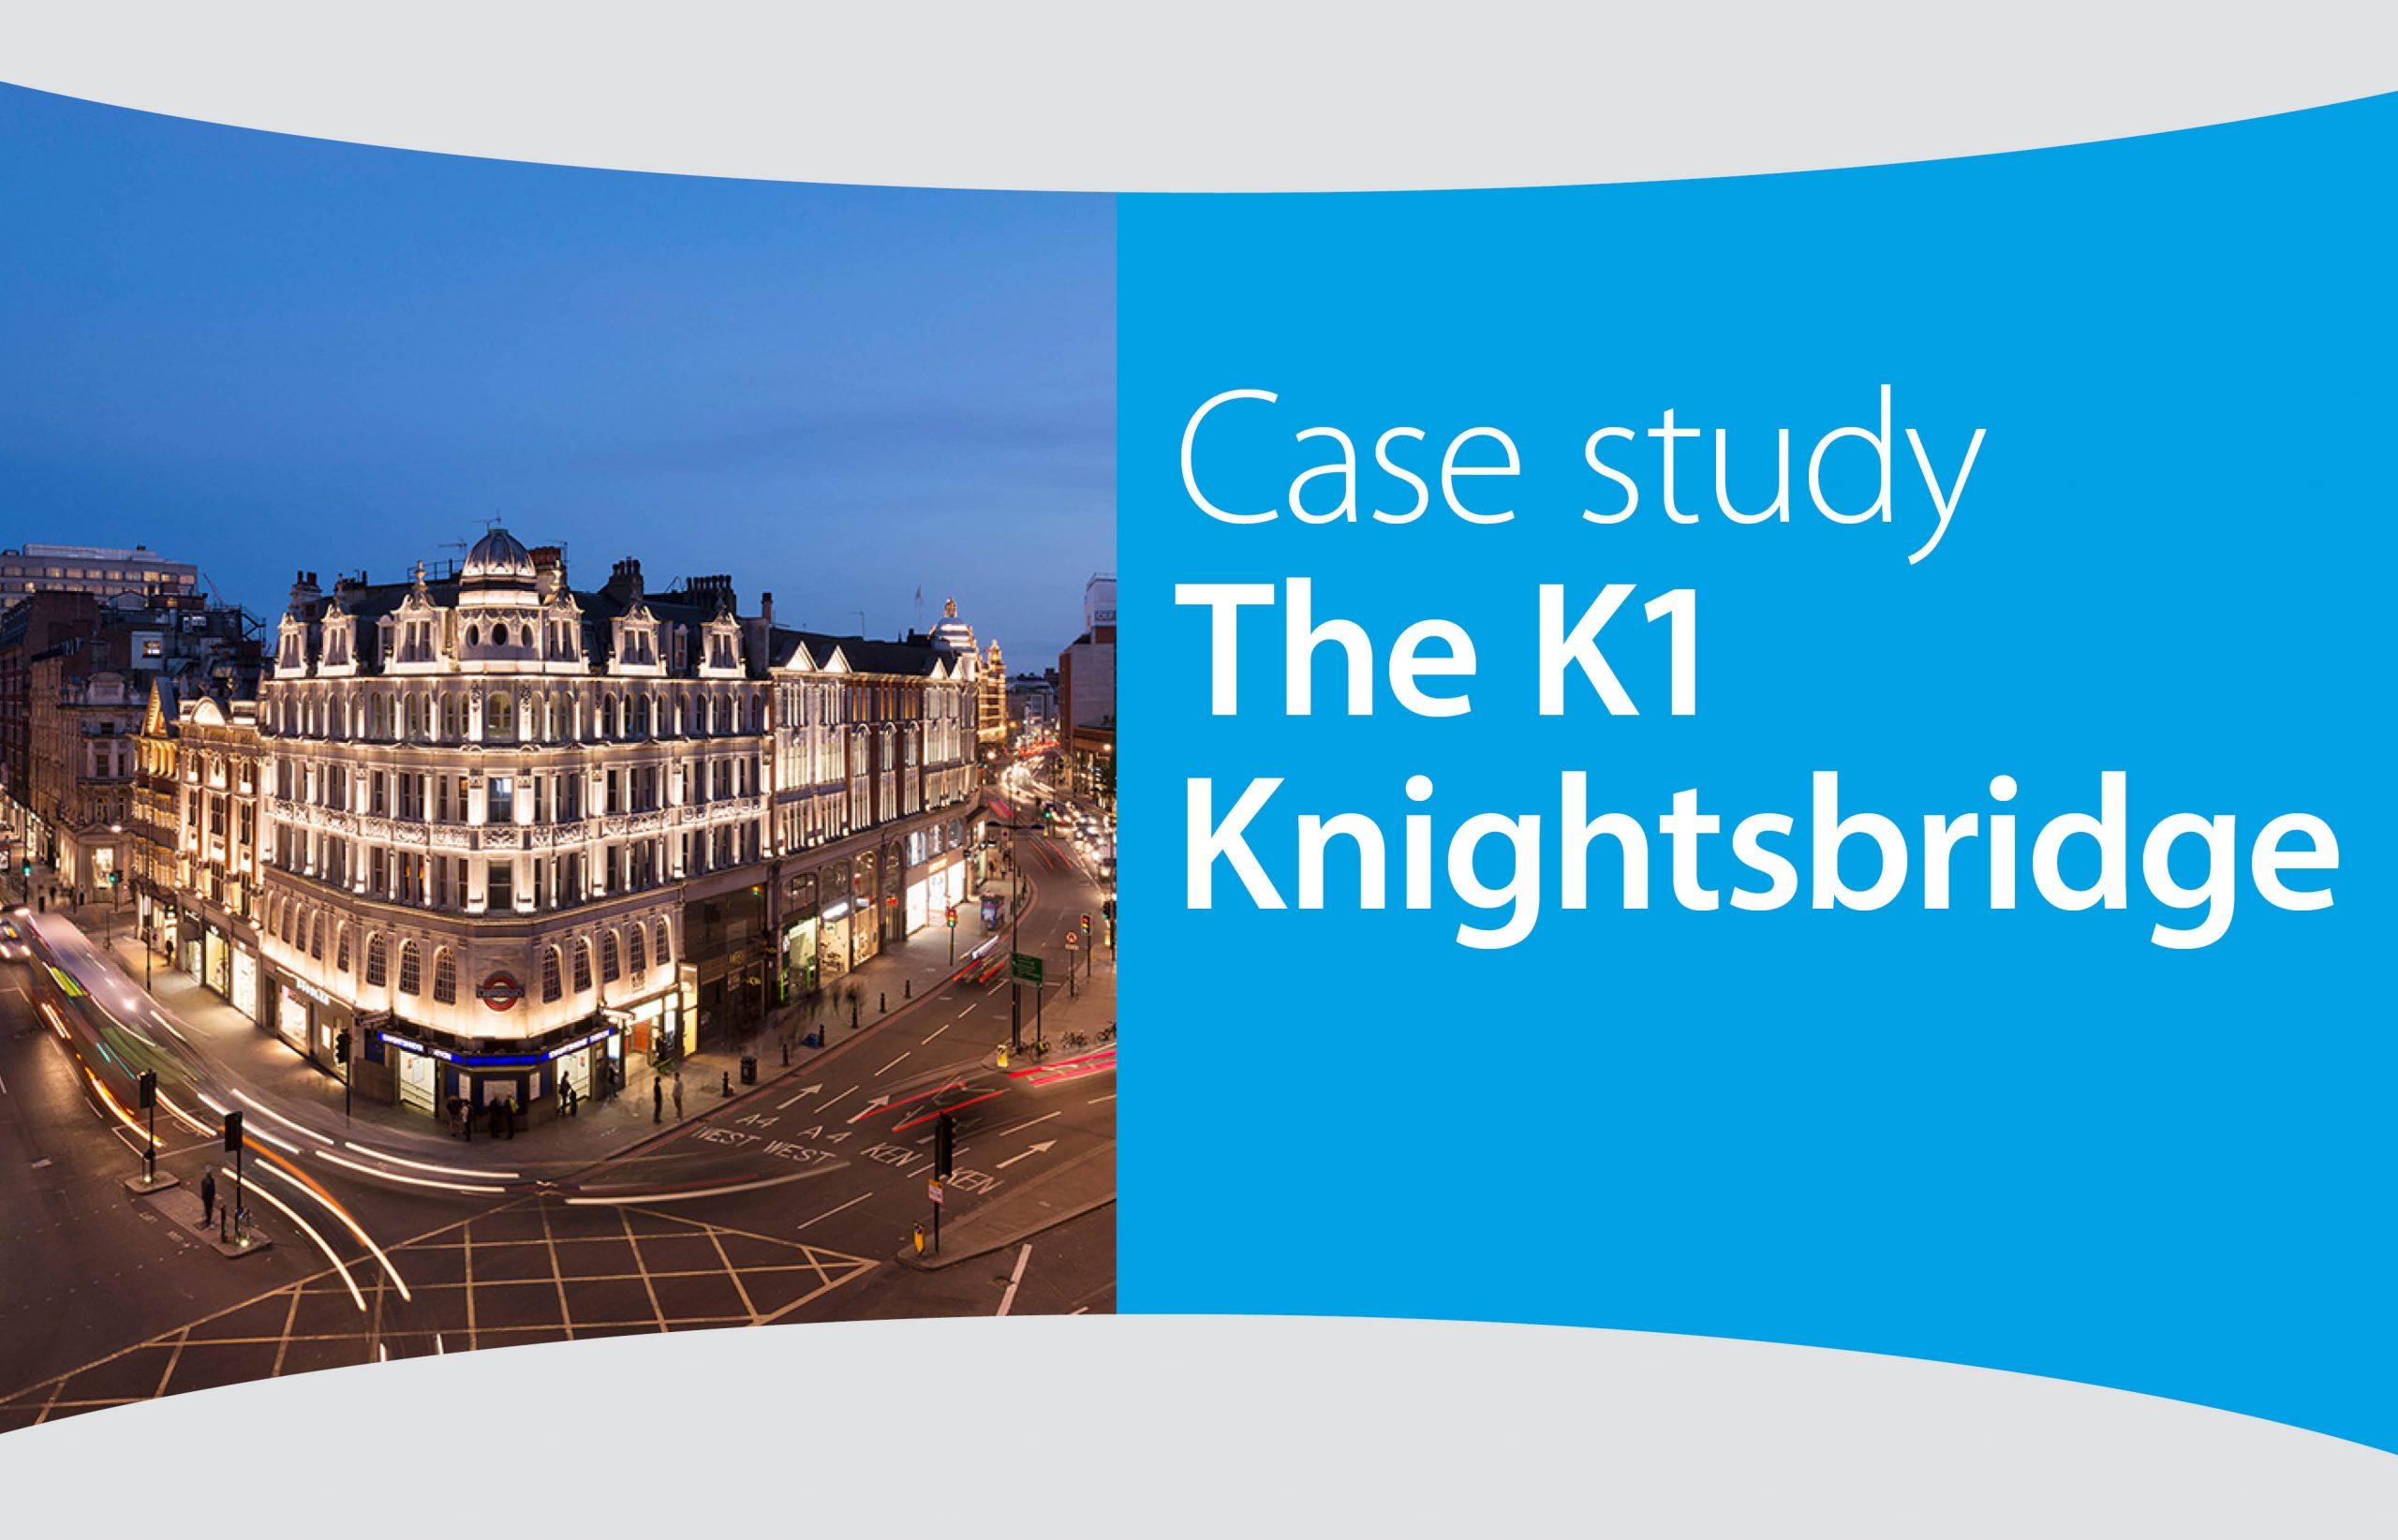 Case study – The K1 Knightsbridge